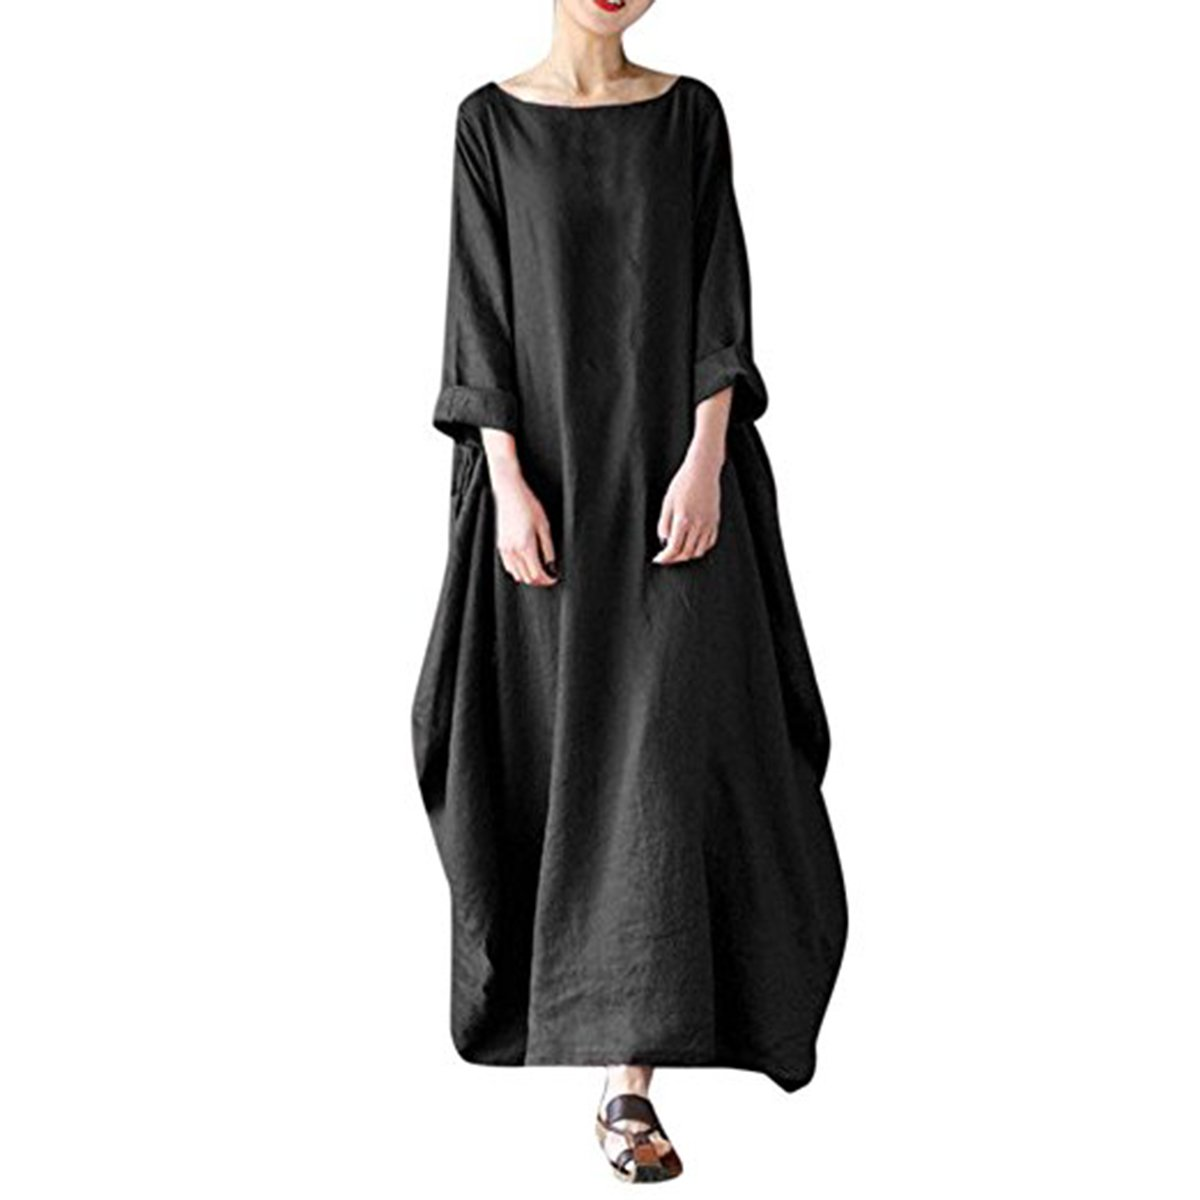 e44799cf3e Womens Vintage Retro Oversized Cotton and Linen Kaftan Long Short Sleeve  Tunic Baggy Long Maxi Shirt Dress Asymmetric Empire Sundress Gown for  Pregnant ...